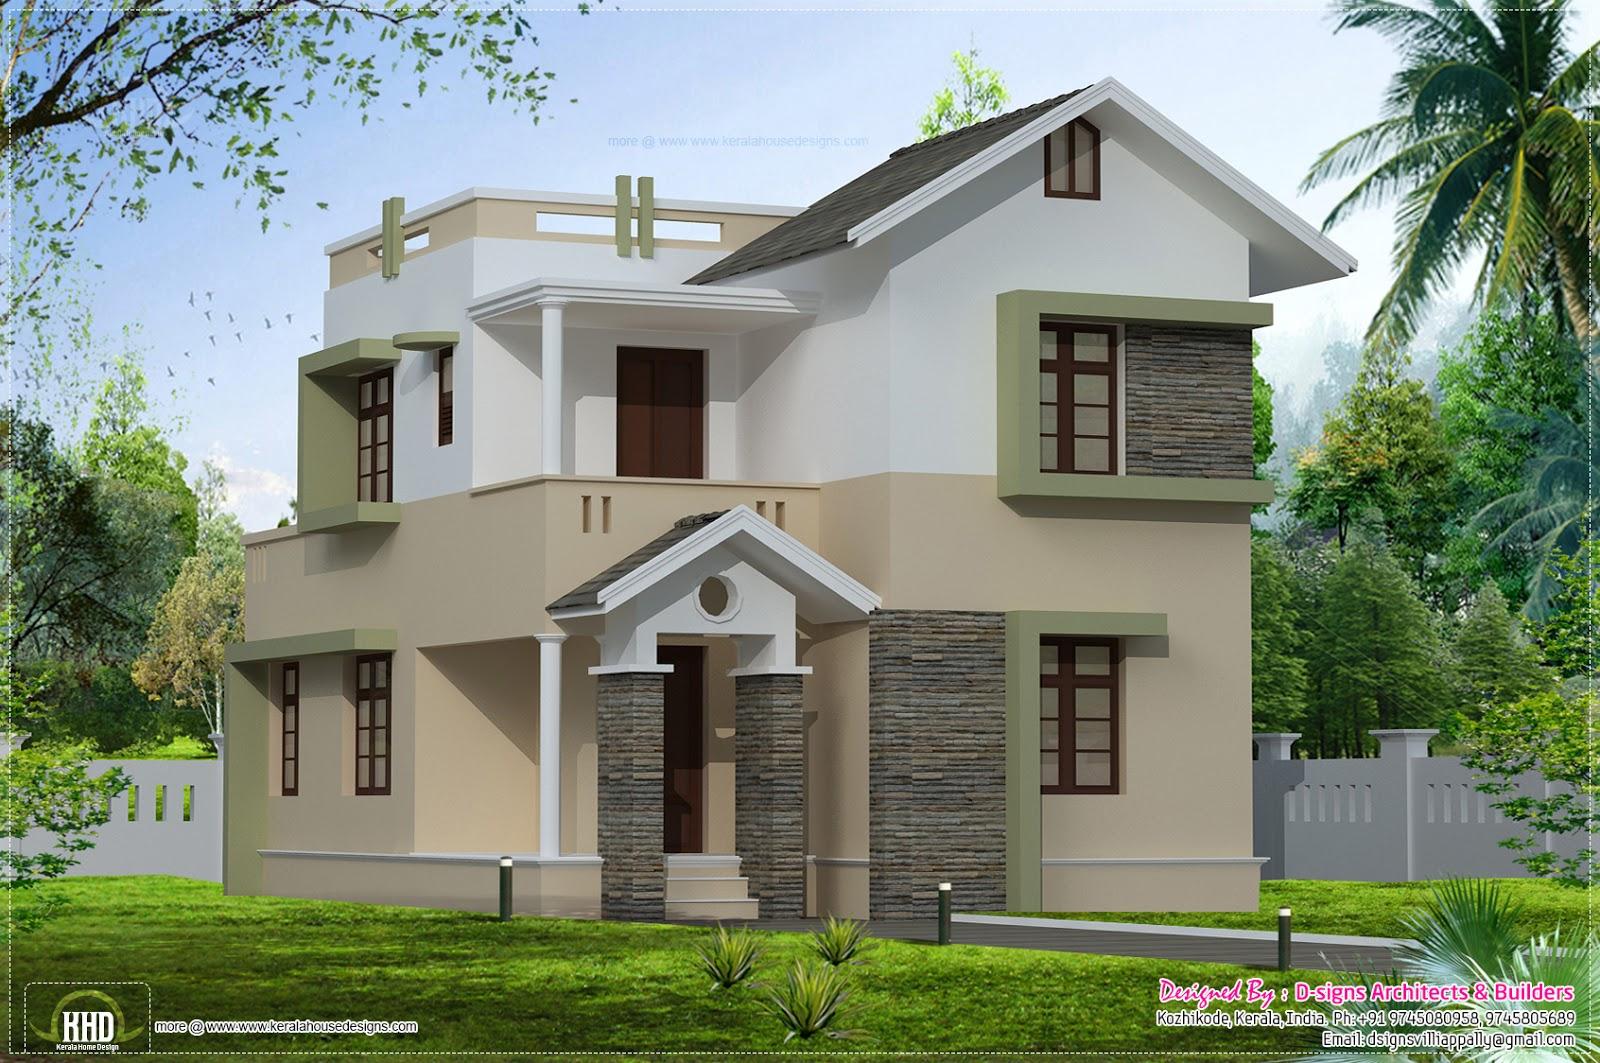 Eco Friendly Houses 1400 Square Feet Small Villa Elevation